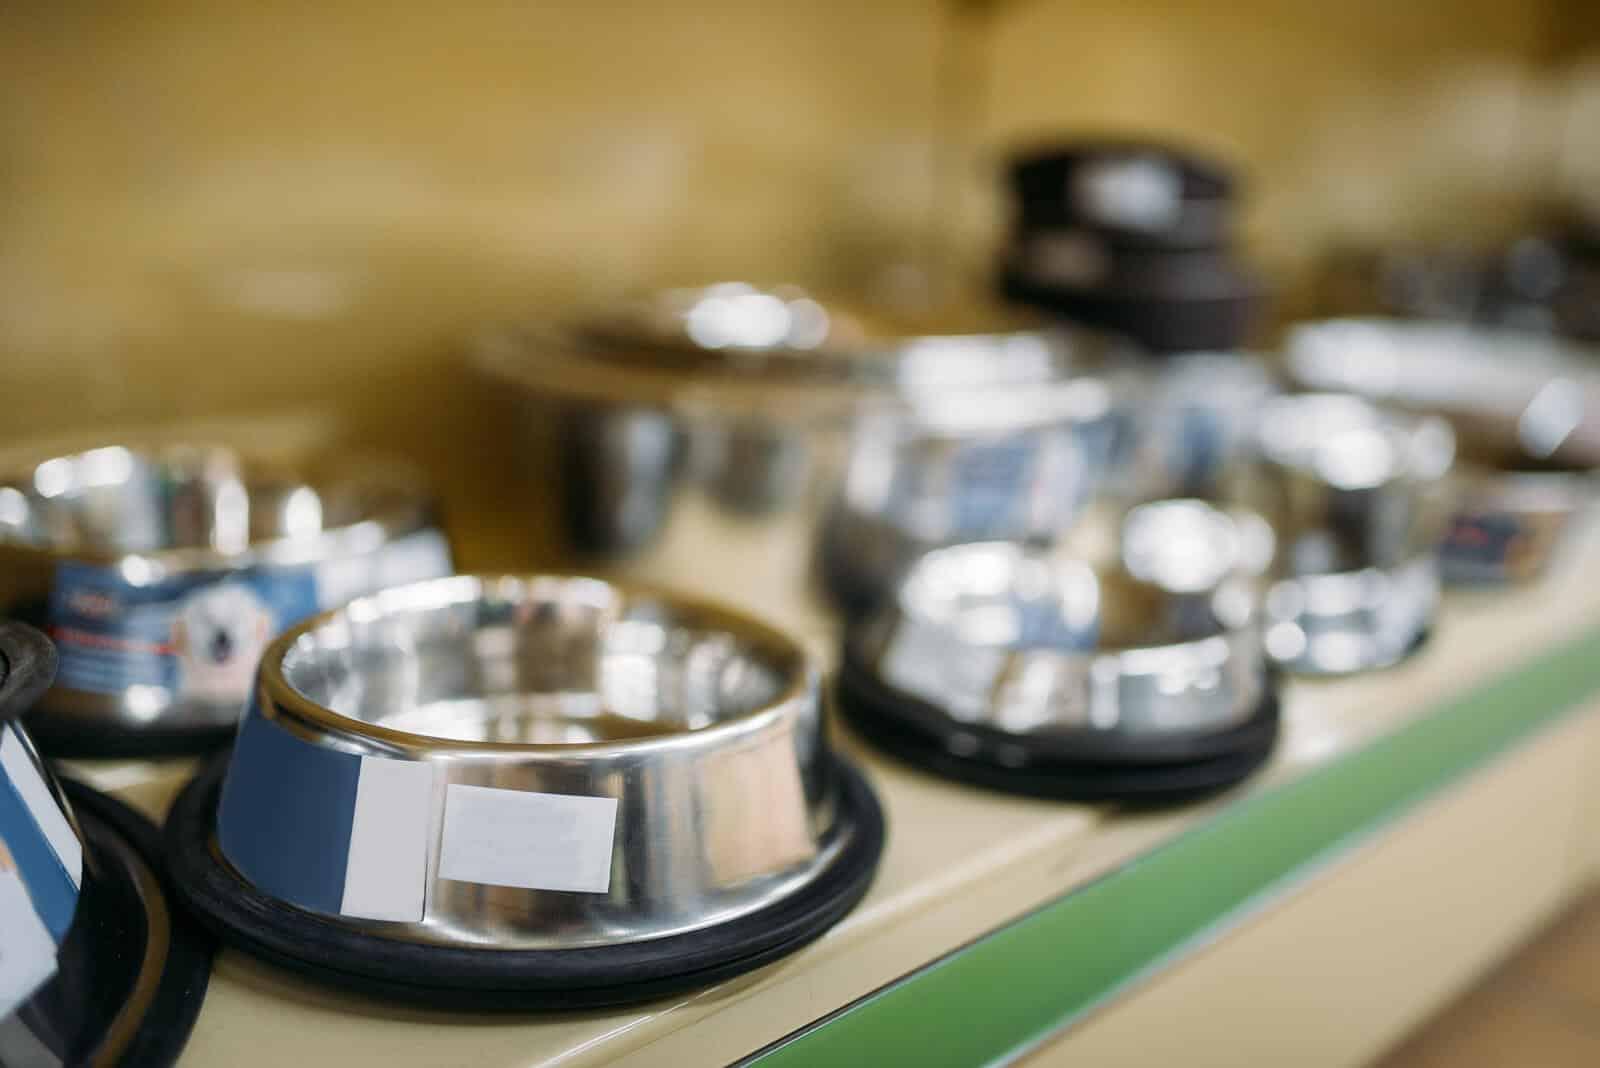 Pet food bowls on display